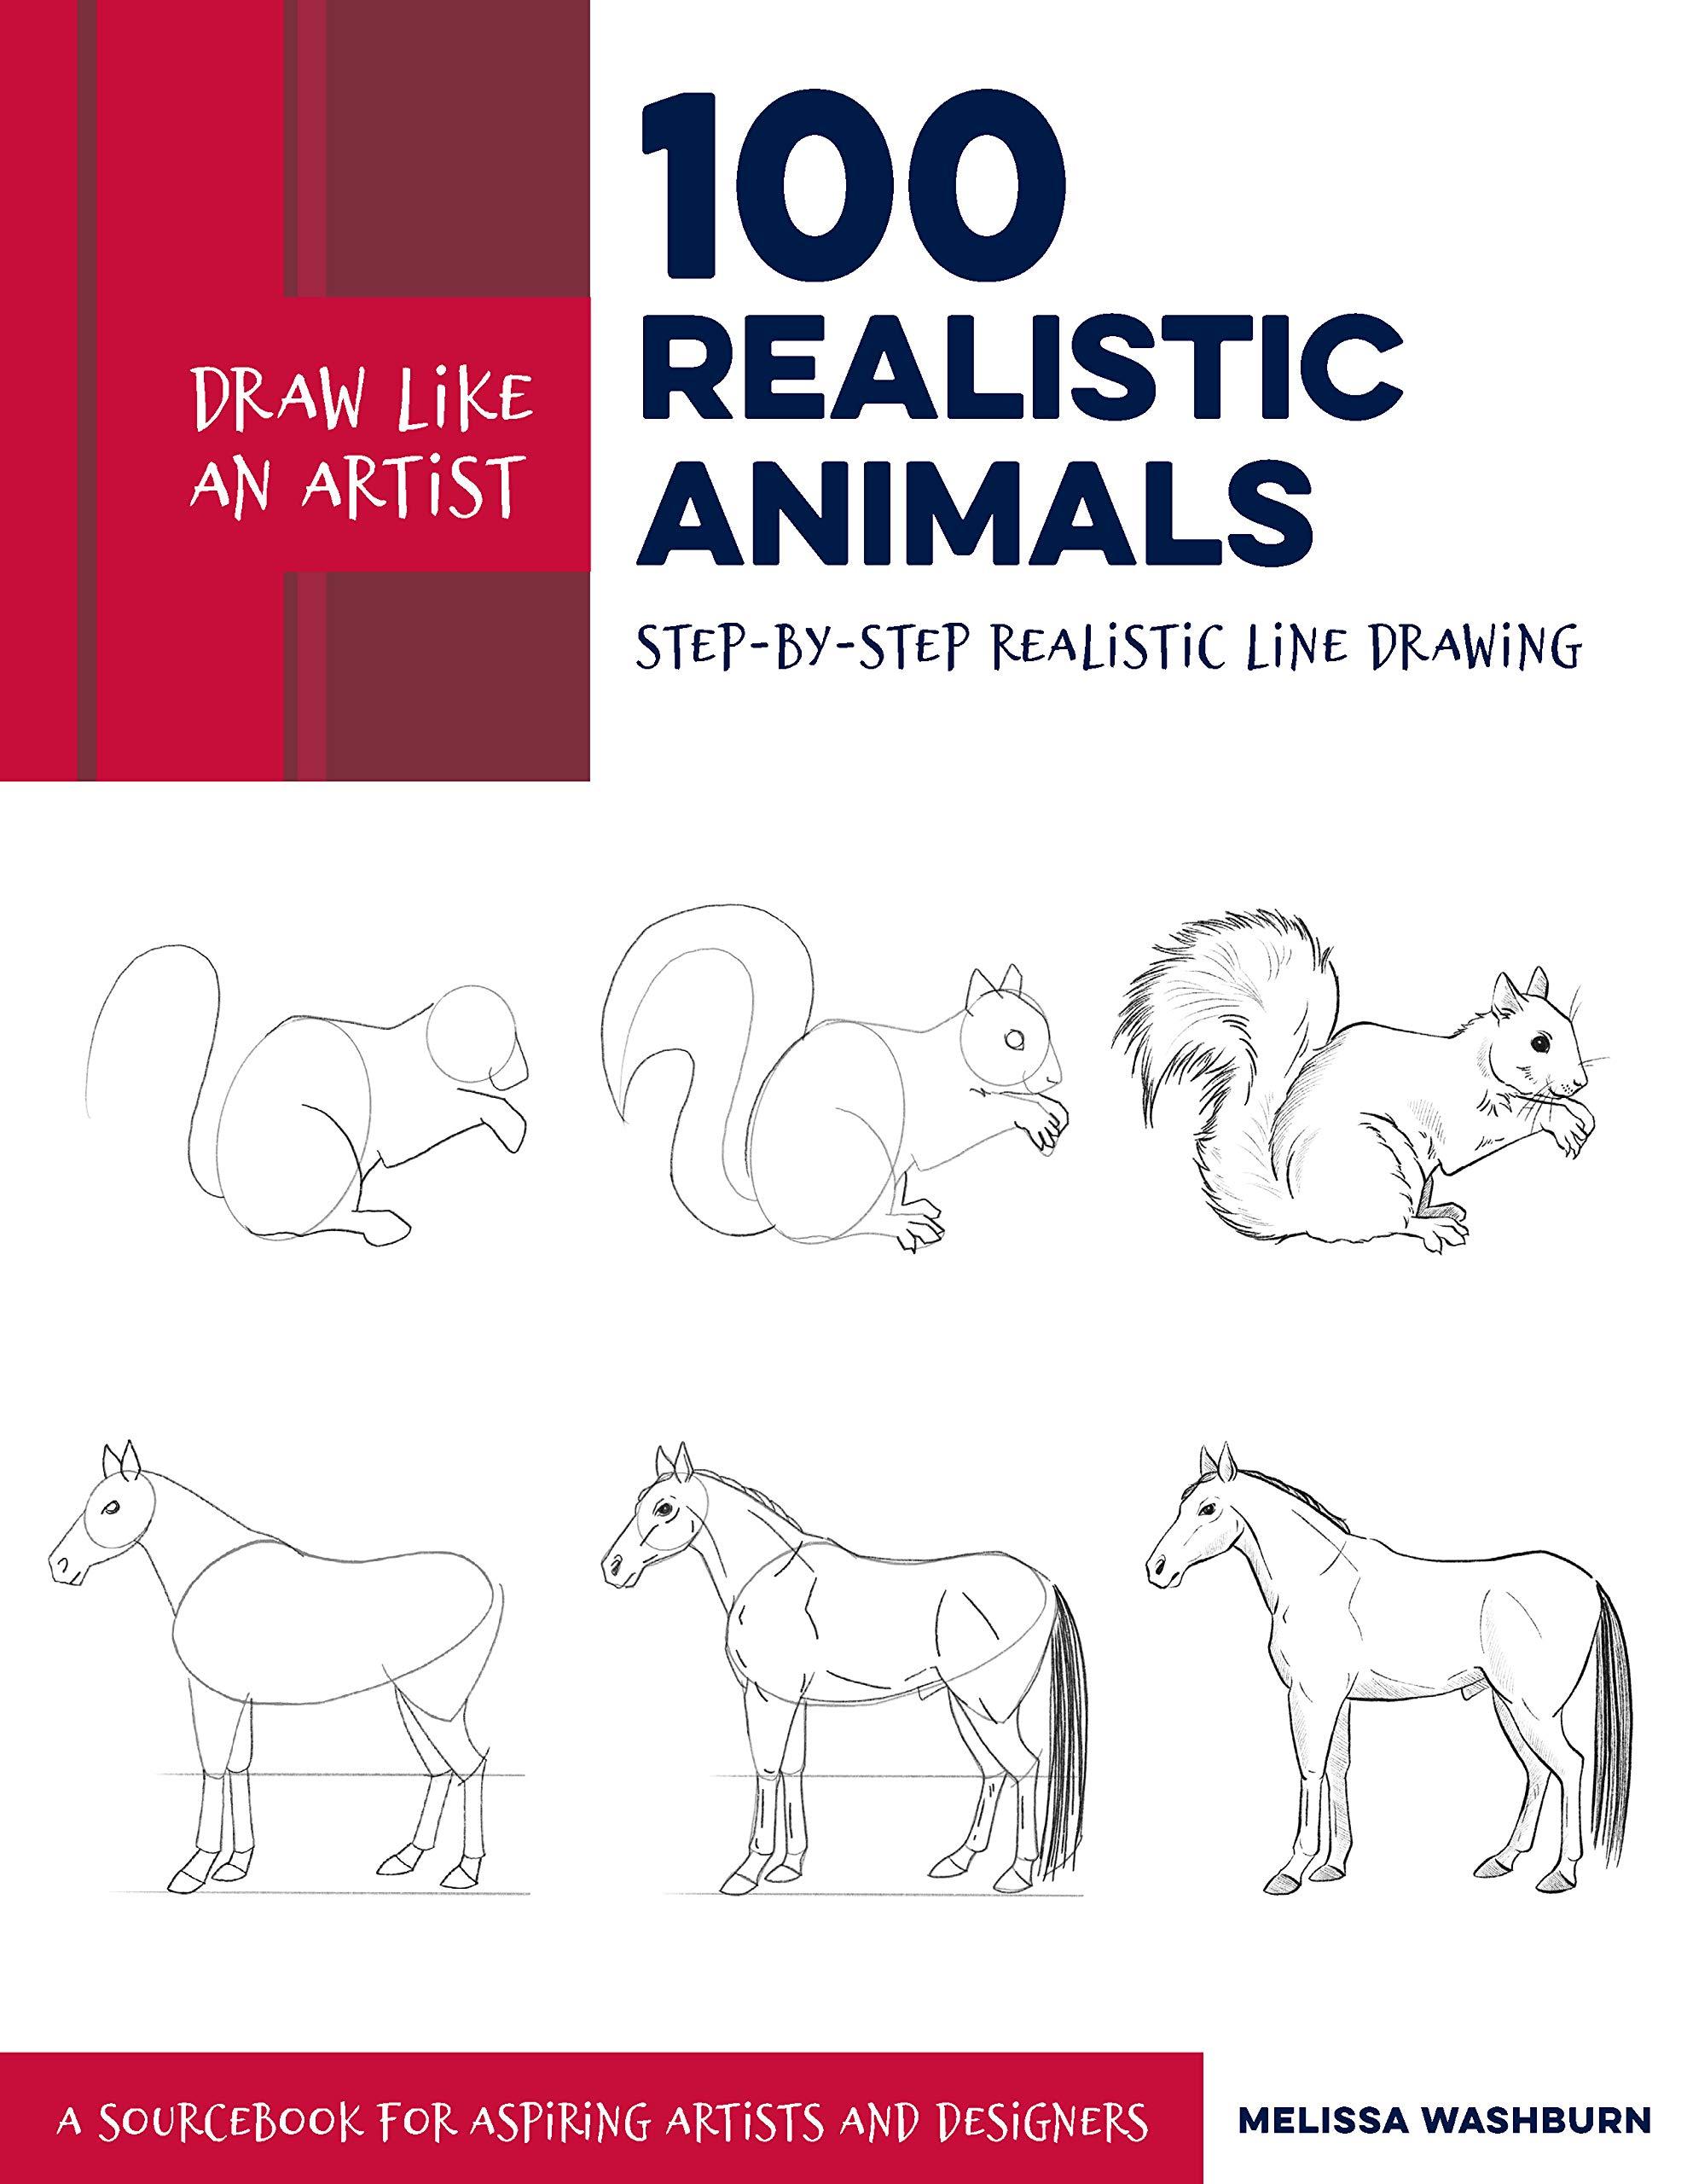 Draw like an artist 100 realistic animals paperback jan 14 2020